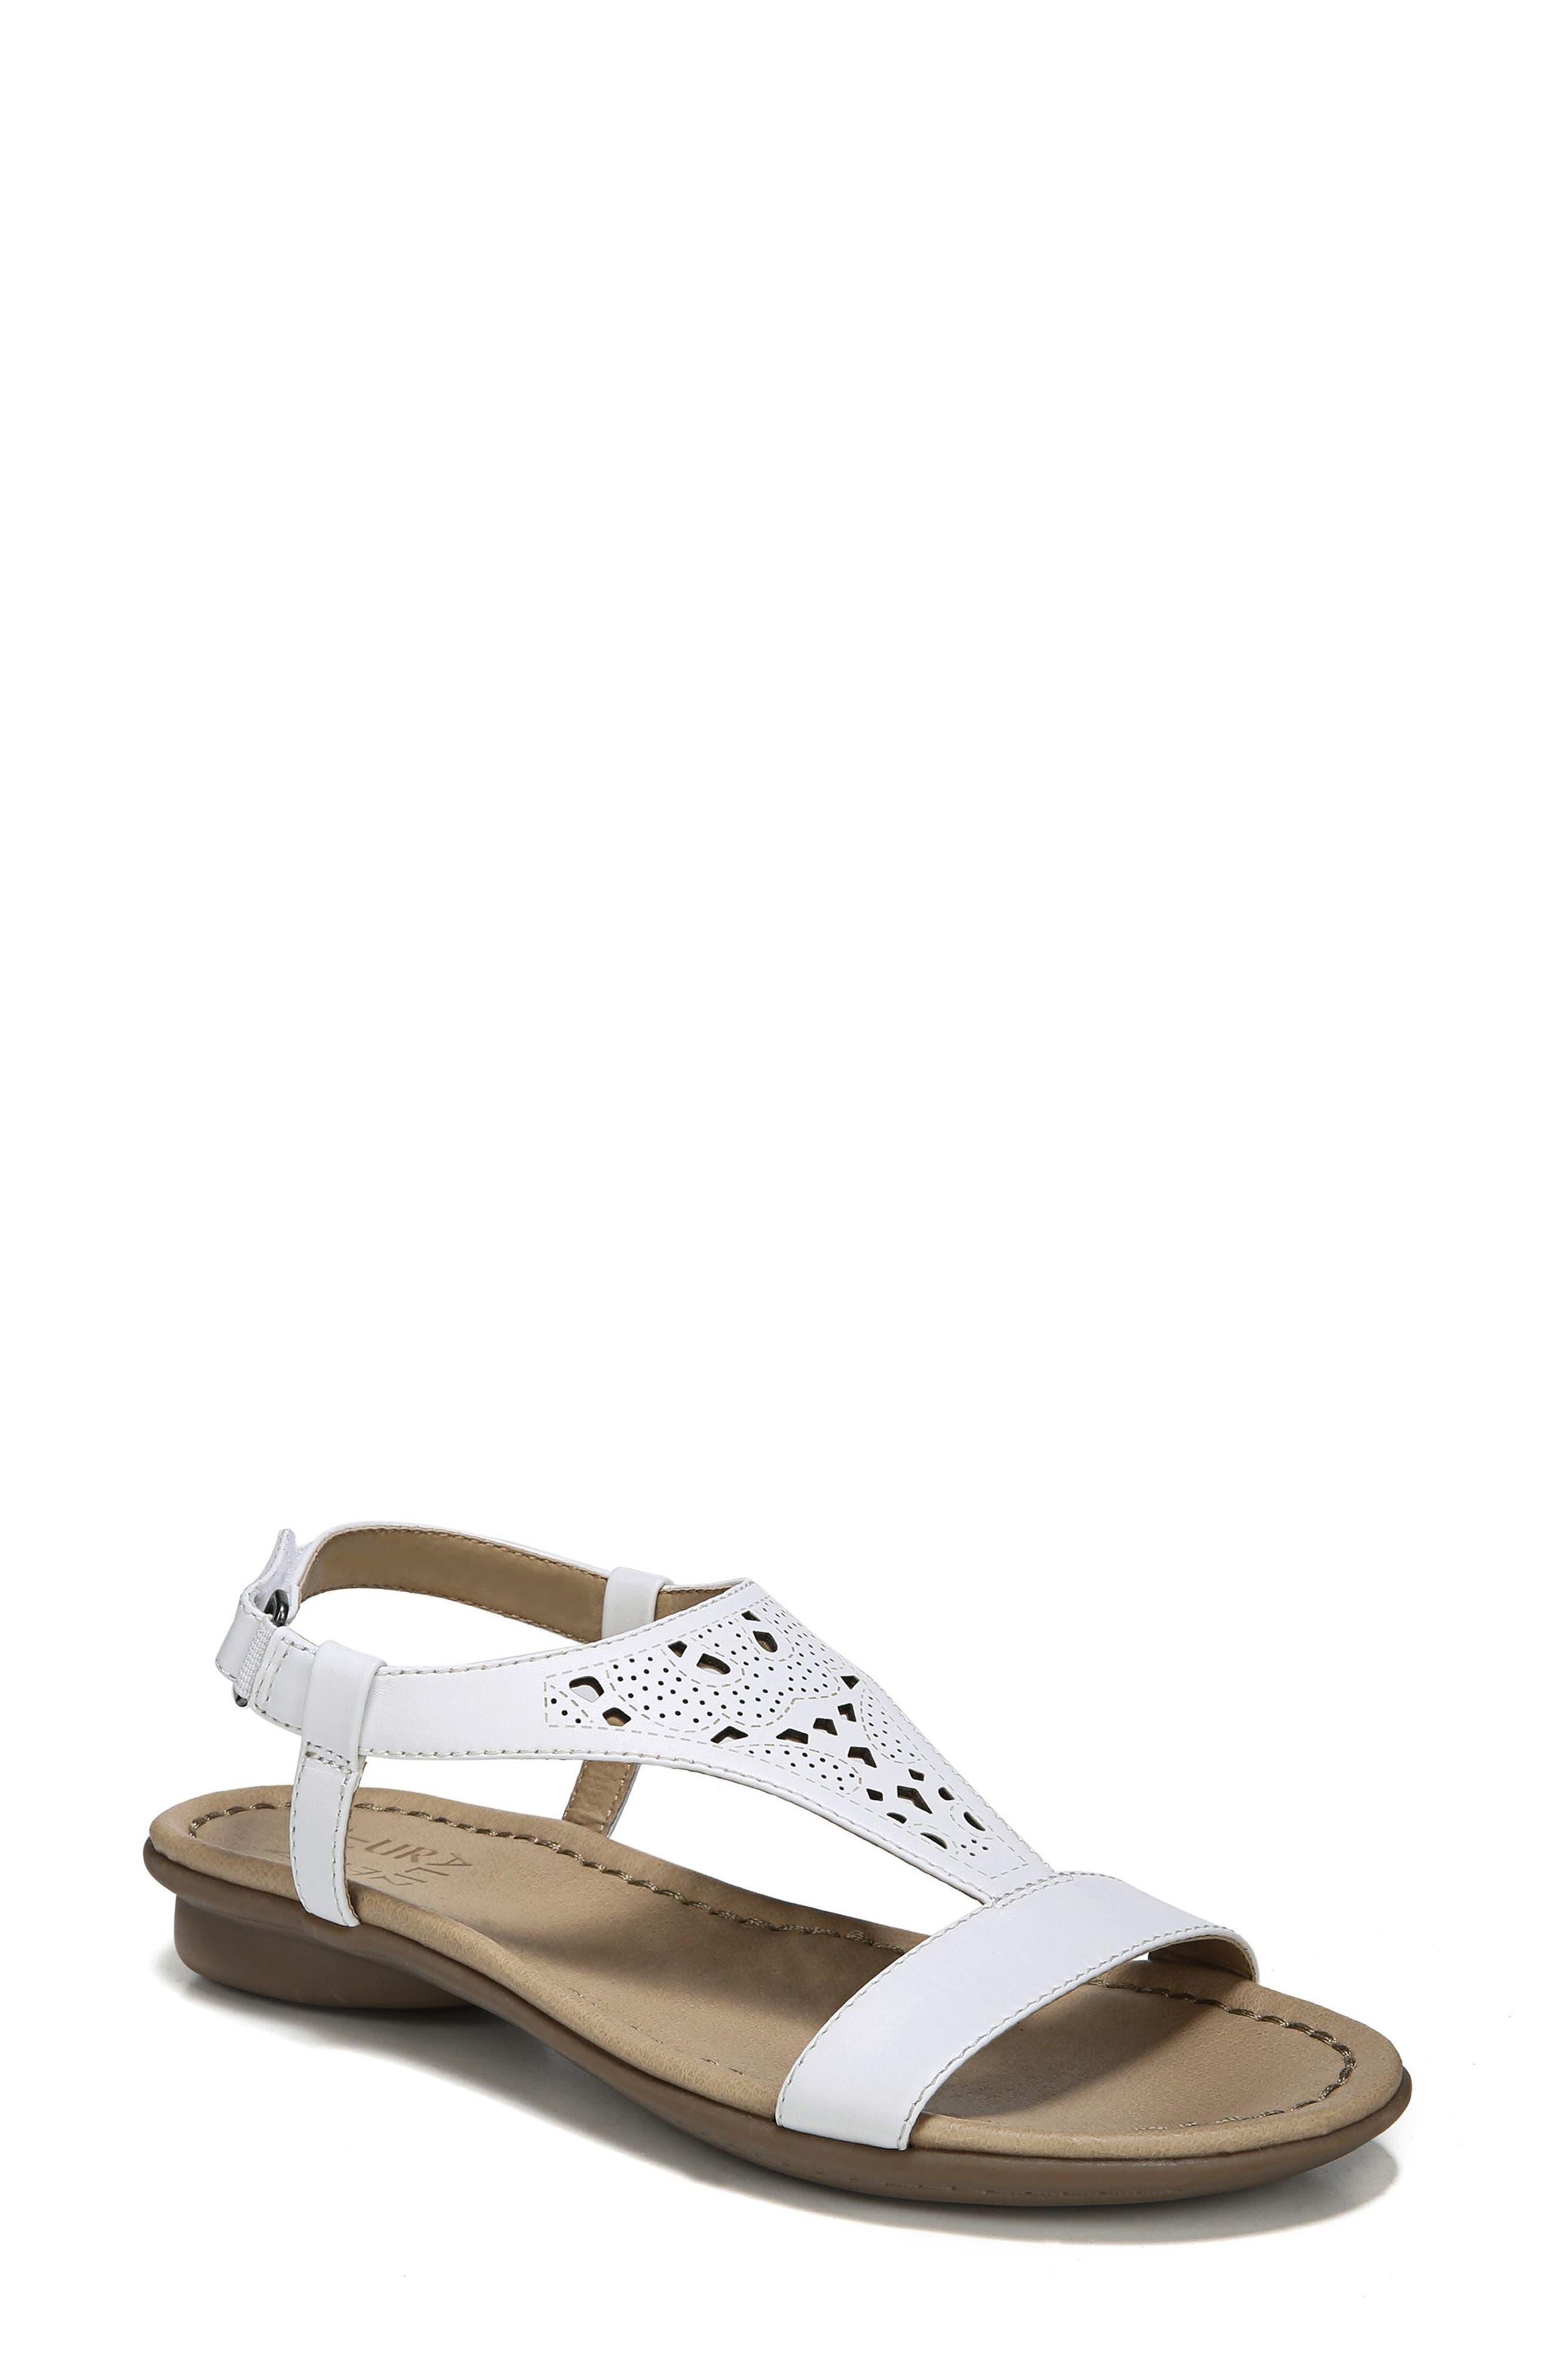 Windham Sandal,                             Main thumbnail 1, color,                             White Leather